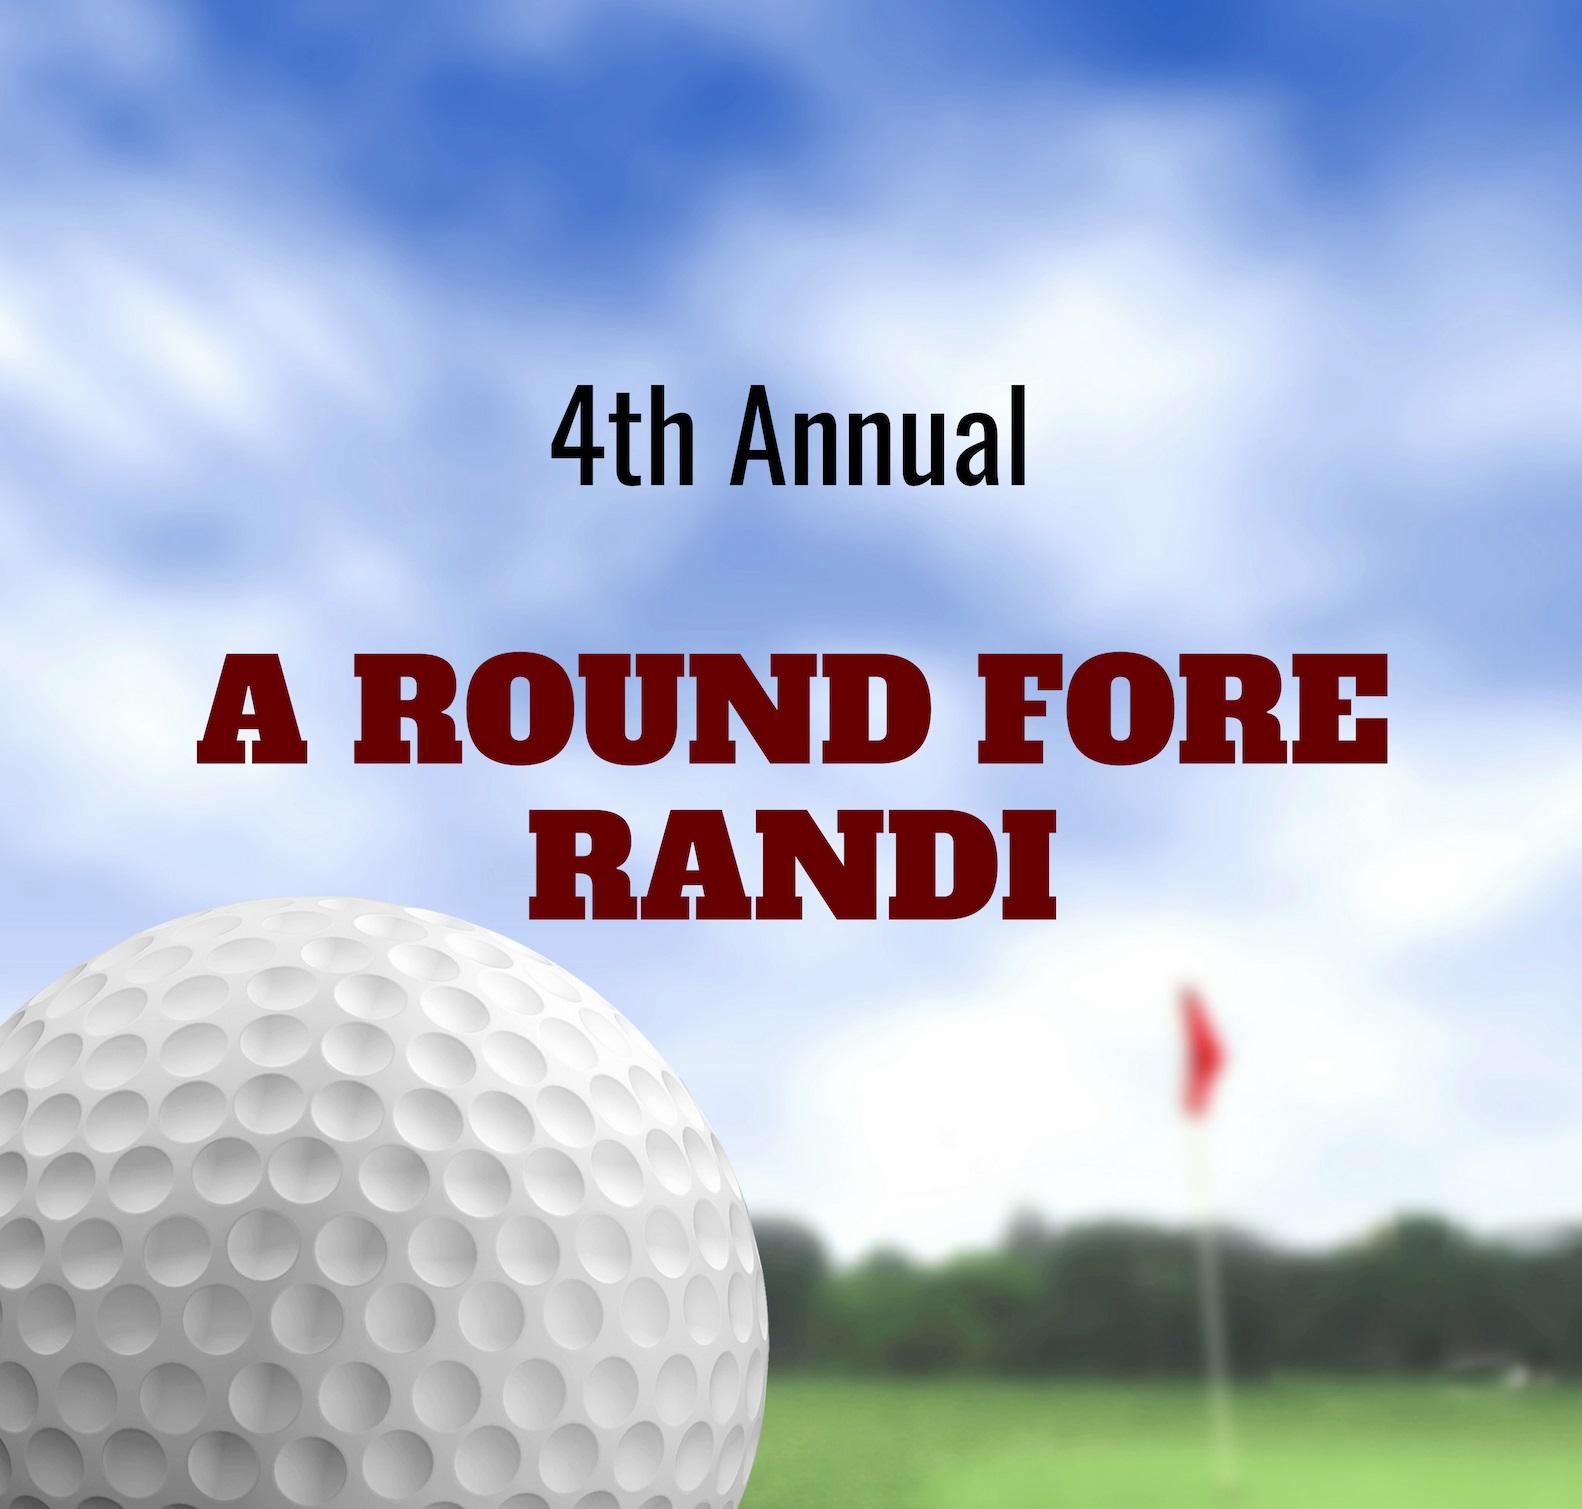 a round fore randi 2019 annual golf tournament randi 39 s. Black Bedroom Furniture Sets. Home Design Ideas